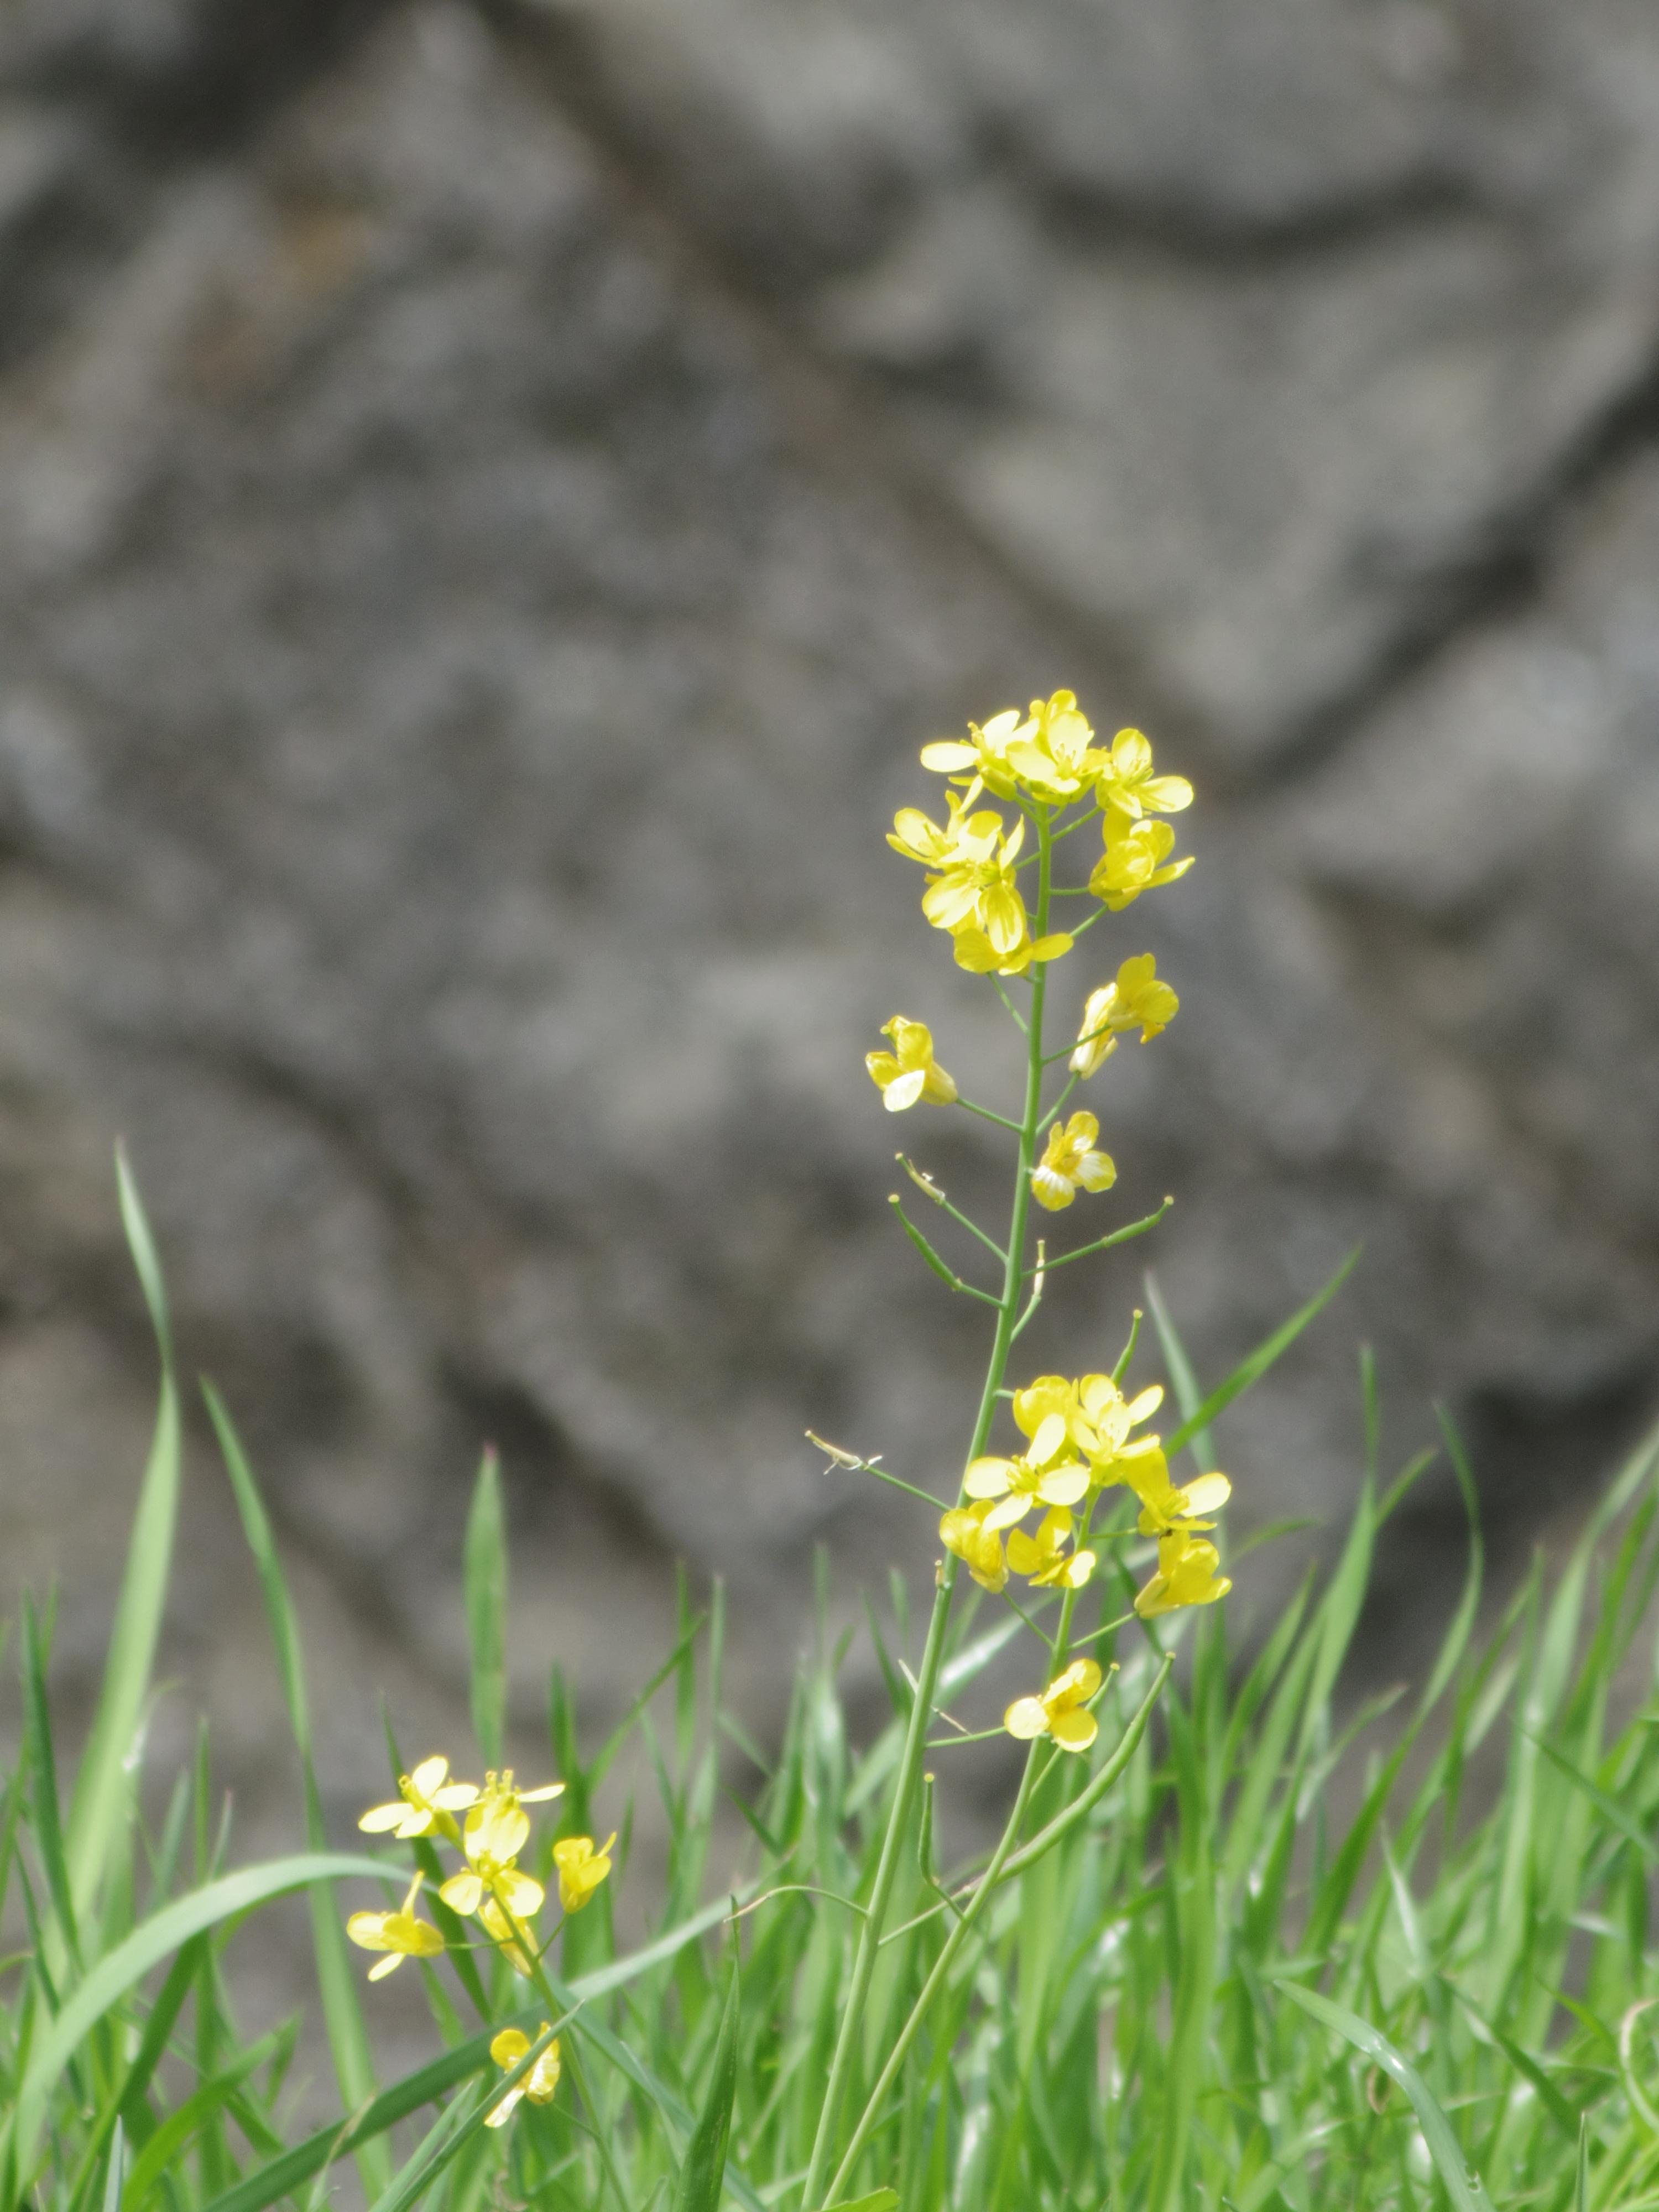 200mmで撮影。川の中州に咲いている菜の花もここまで拡大できました。PENTAX Q10 / DA 50-200mm F4-5.6 ED WR / 約3.2MB / 4,000×3,000 / 1/80秒 / 絞り目盛り:0 / 0EV / ISO100 / 絞り優先AE / WB:オート / 200mm